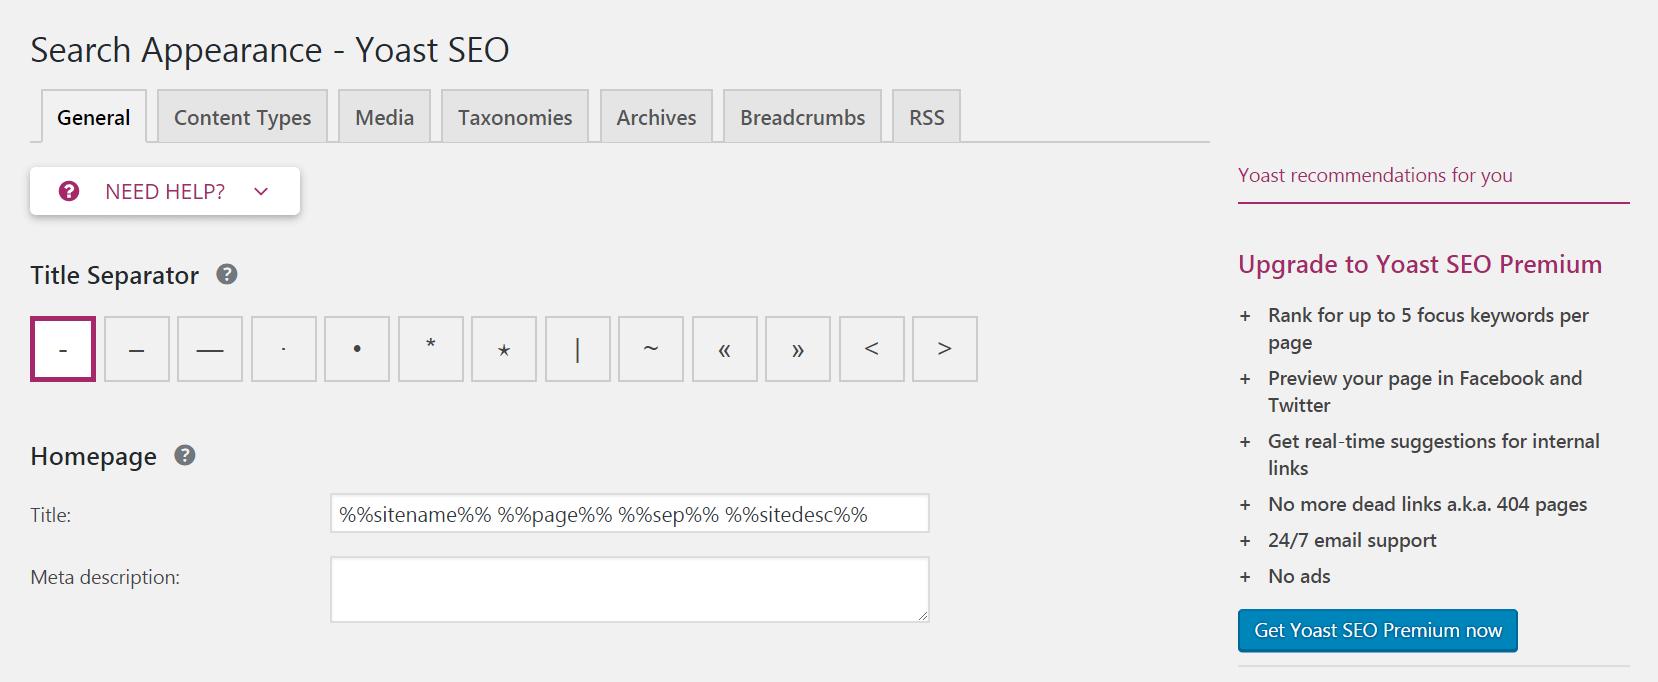 The Yoast SEO settings screen.